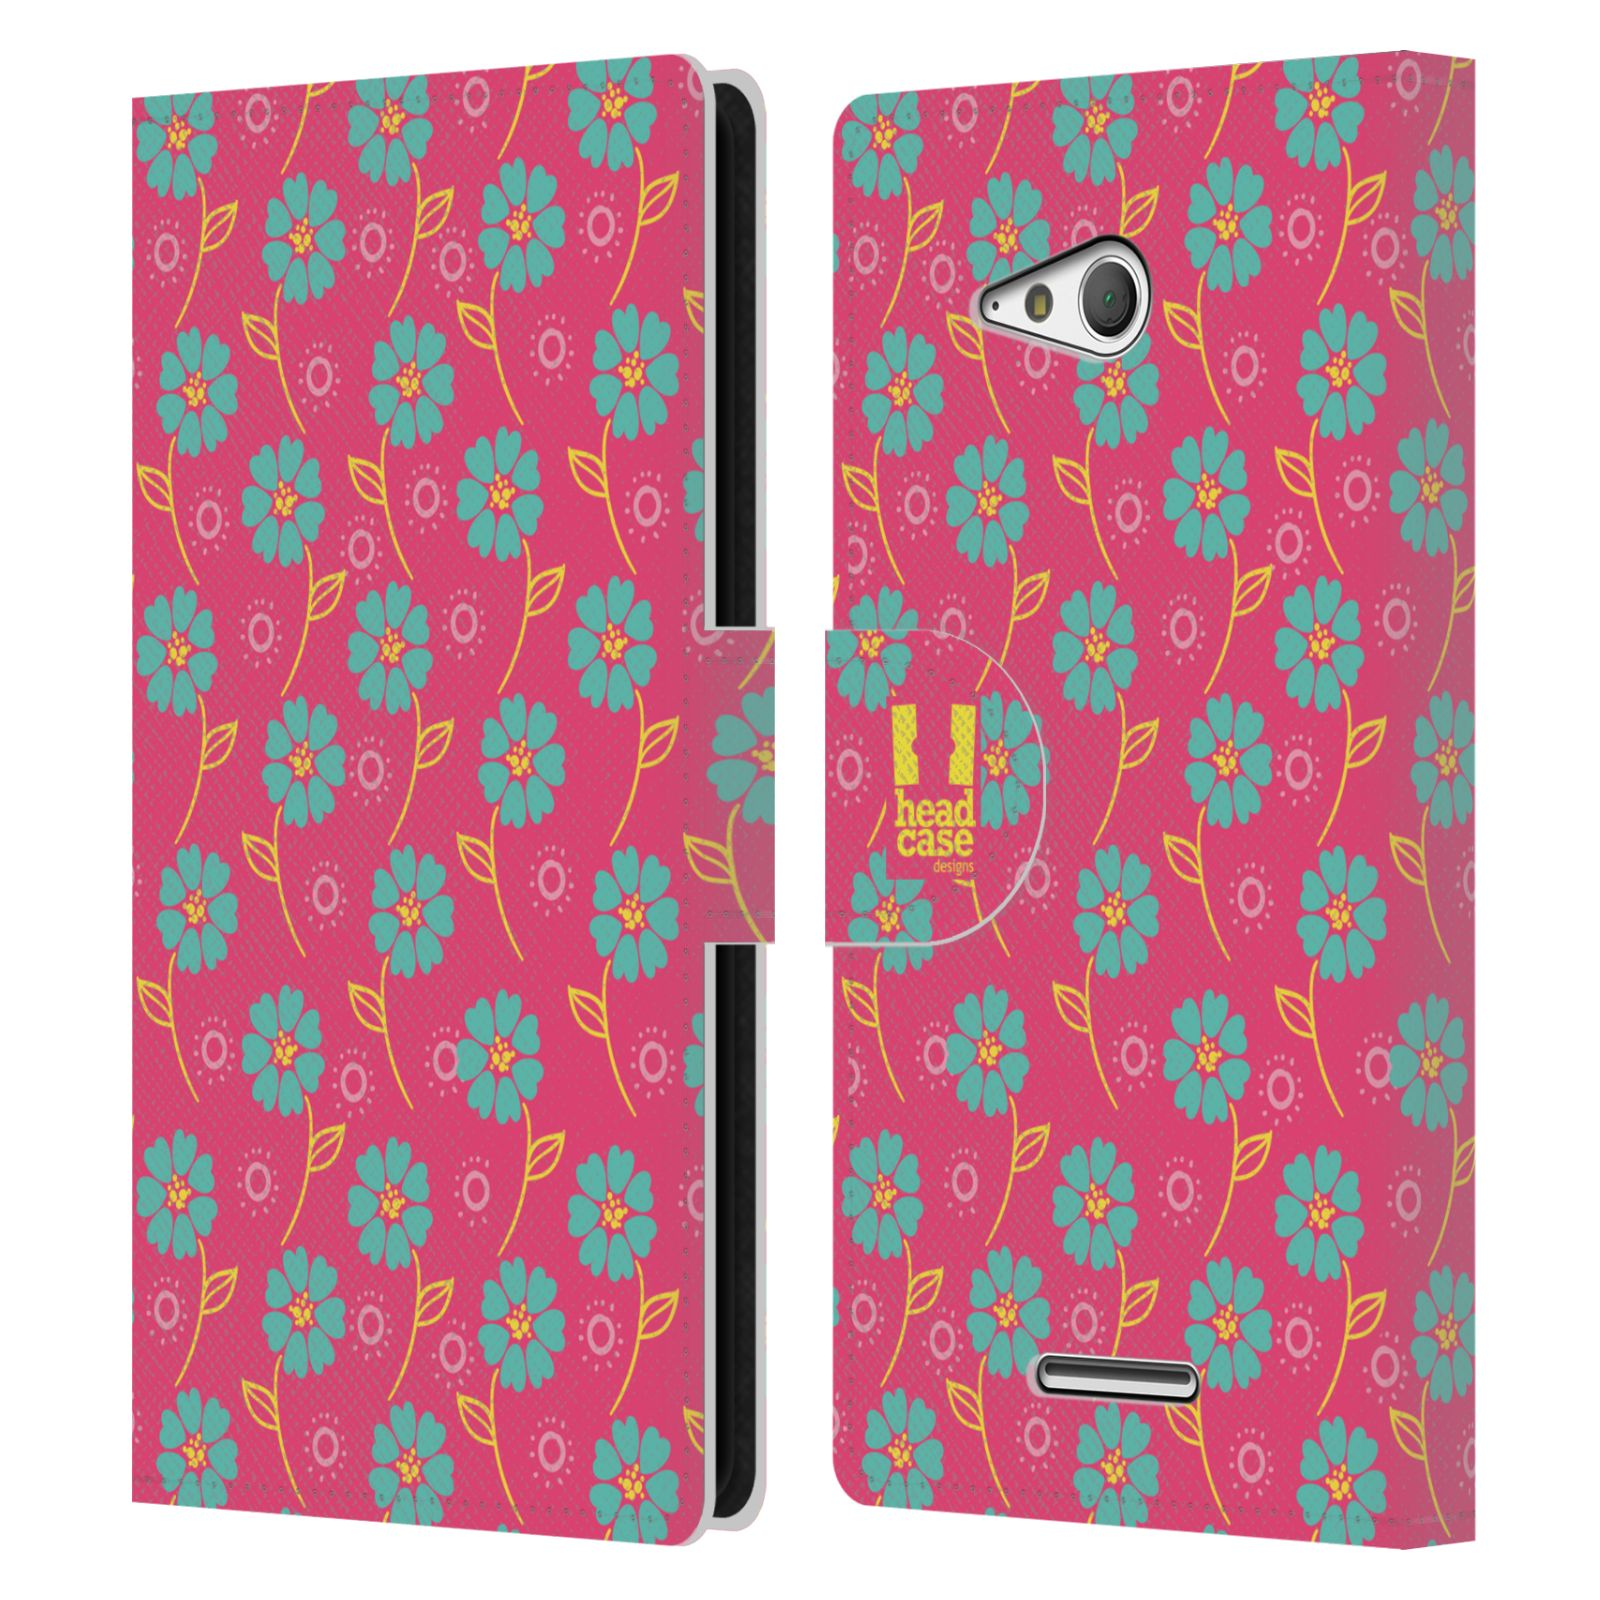 HEAD CASE Flipové pouzdro pro mobil SONY XPERIA E4g Slovanský vzor růžová a modrá květiny